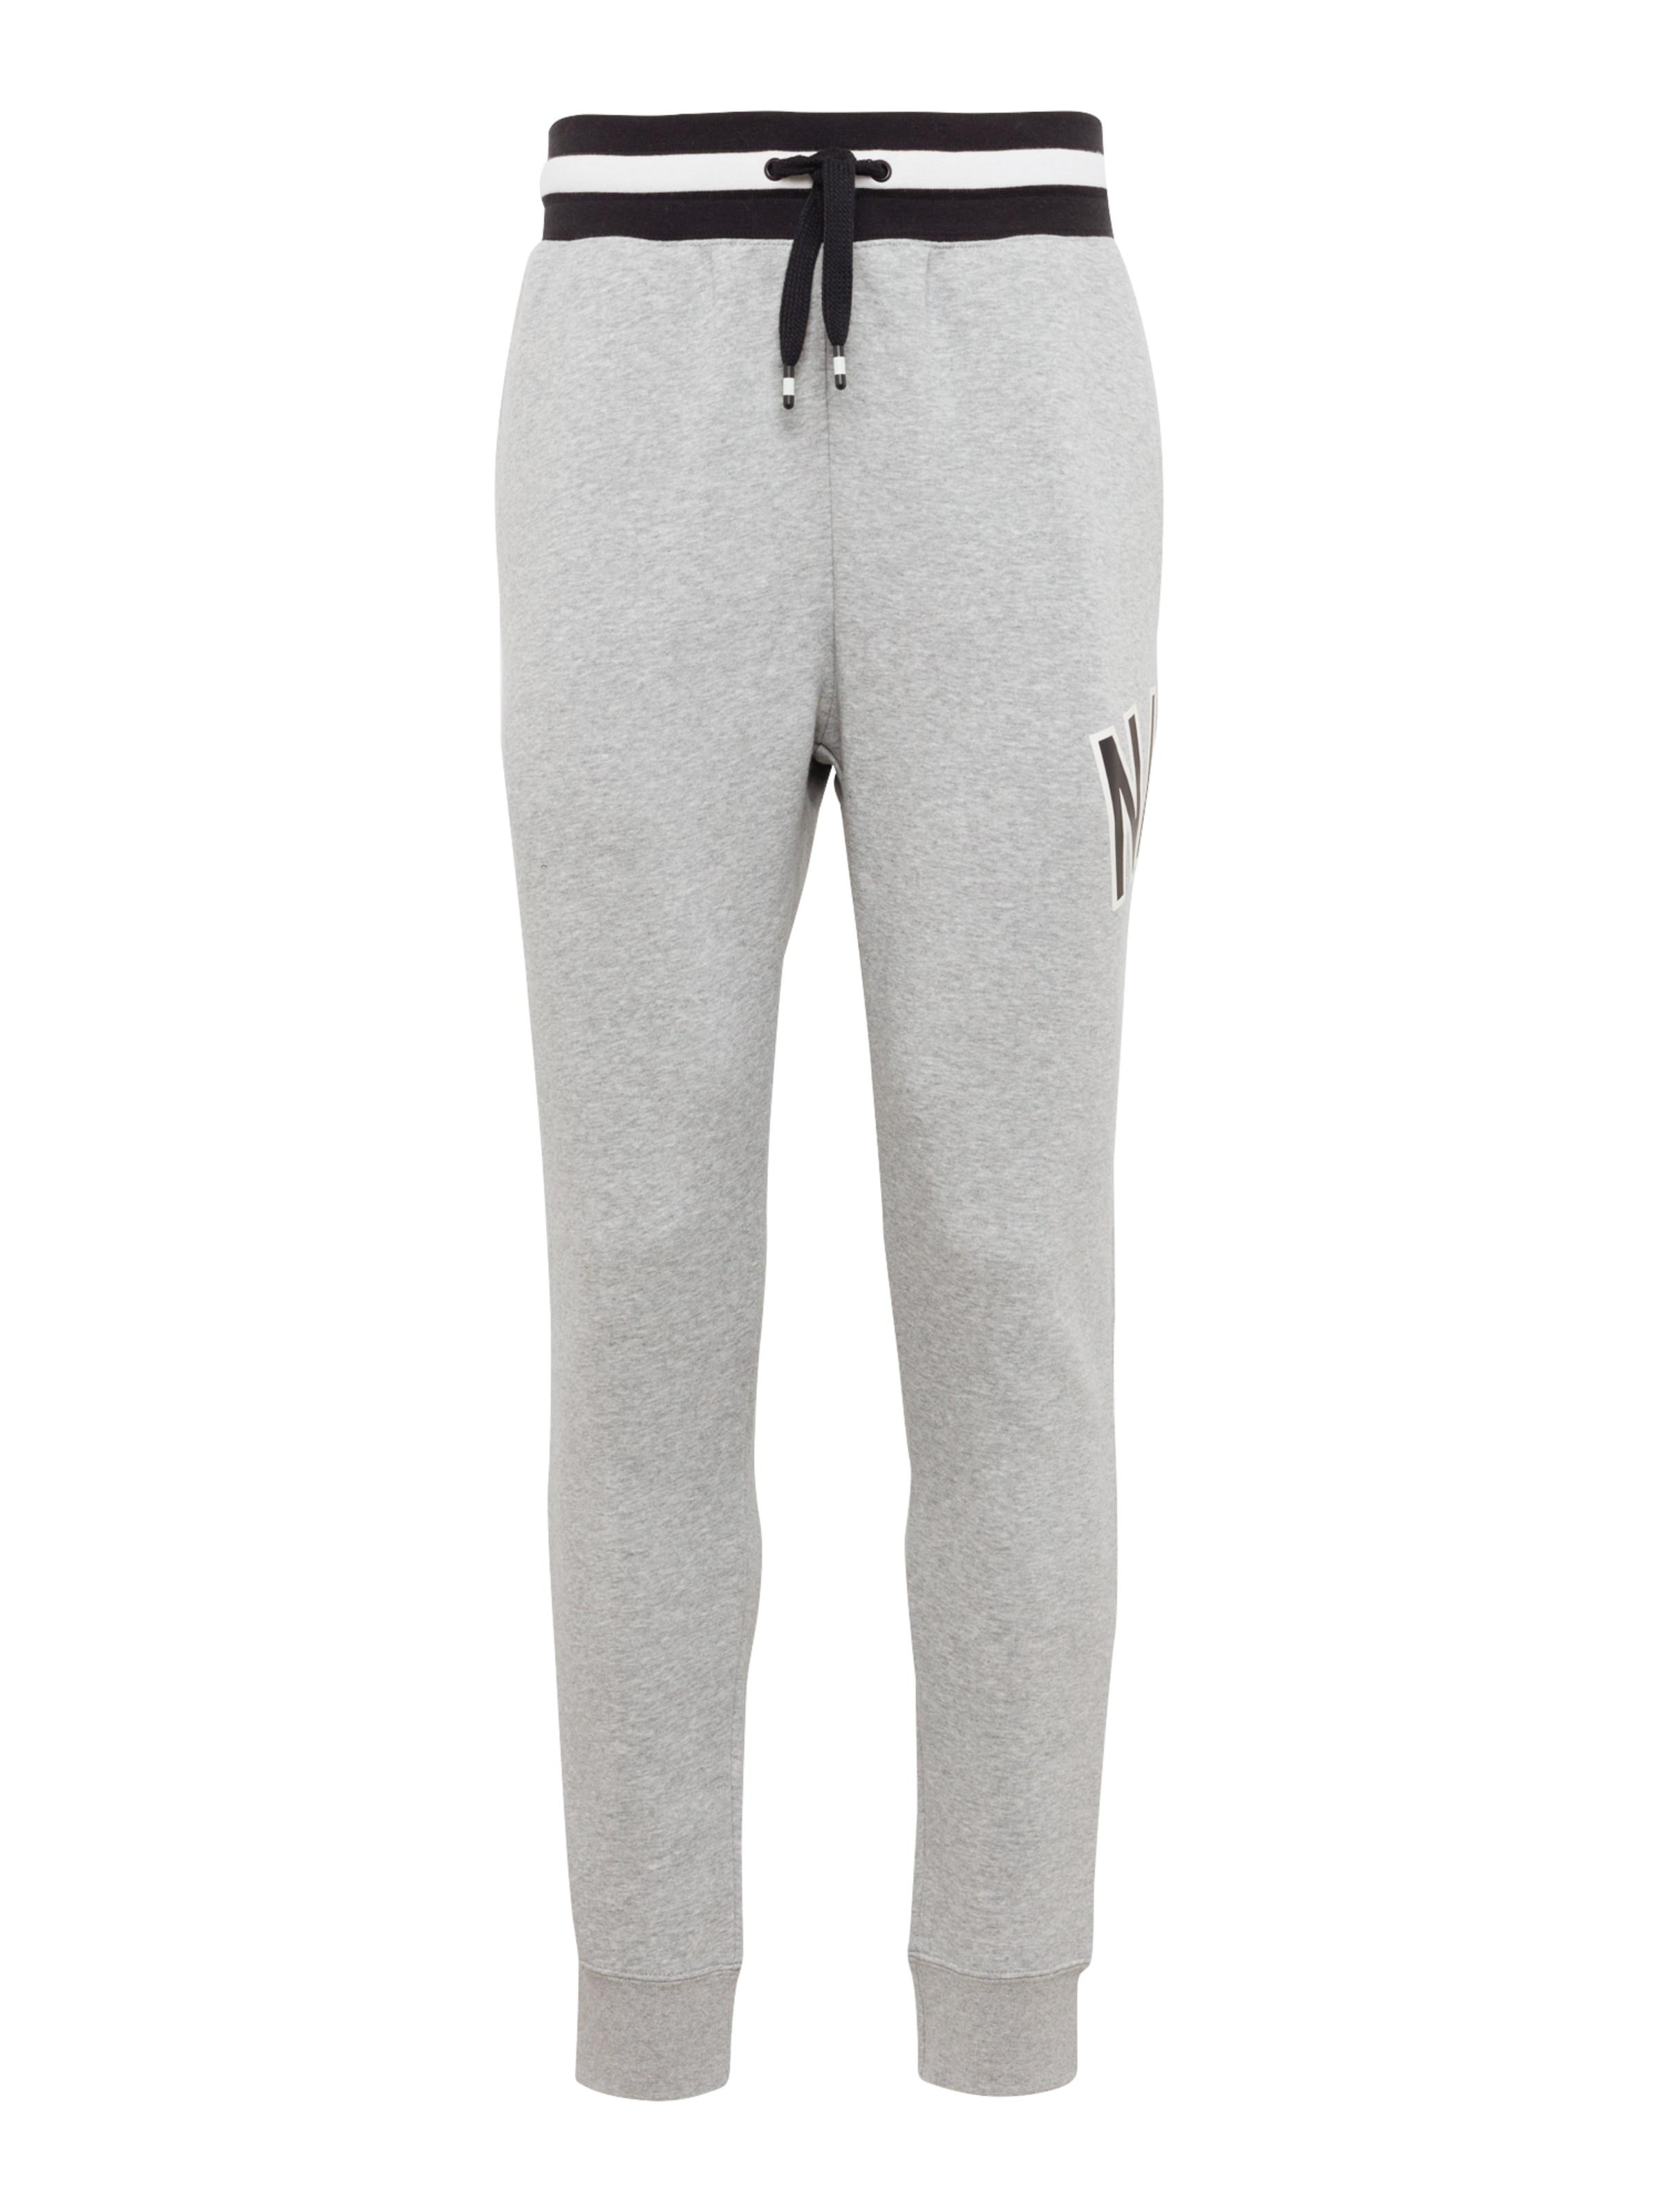 5f565730b Nike Sportswear Nohavice 'M NSW NIKE AIR PANT FLC' Sivá - Glami.sk